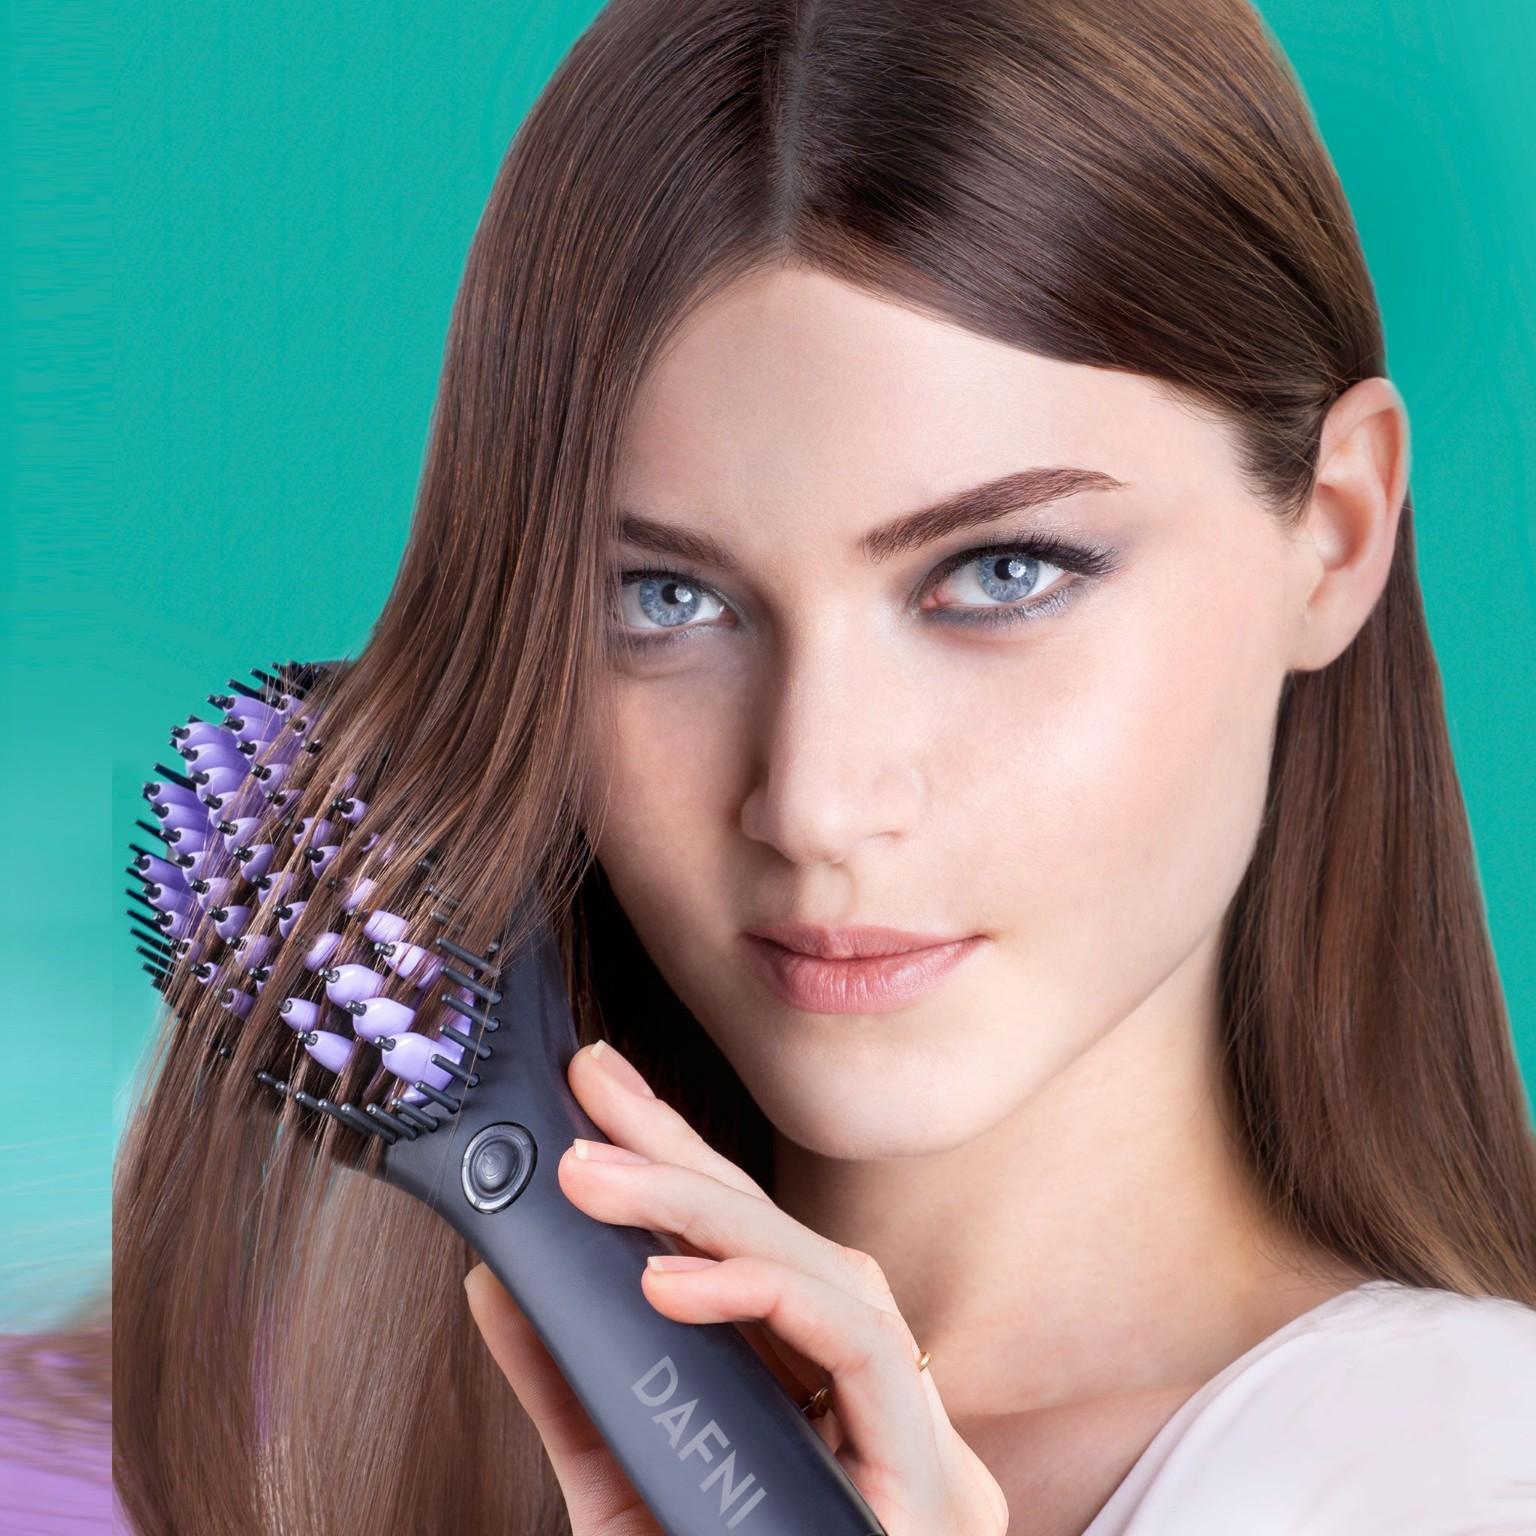 DAFNI LISSEUR مصفف الشعر الأصلي الأكثر فعالية